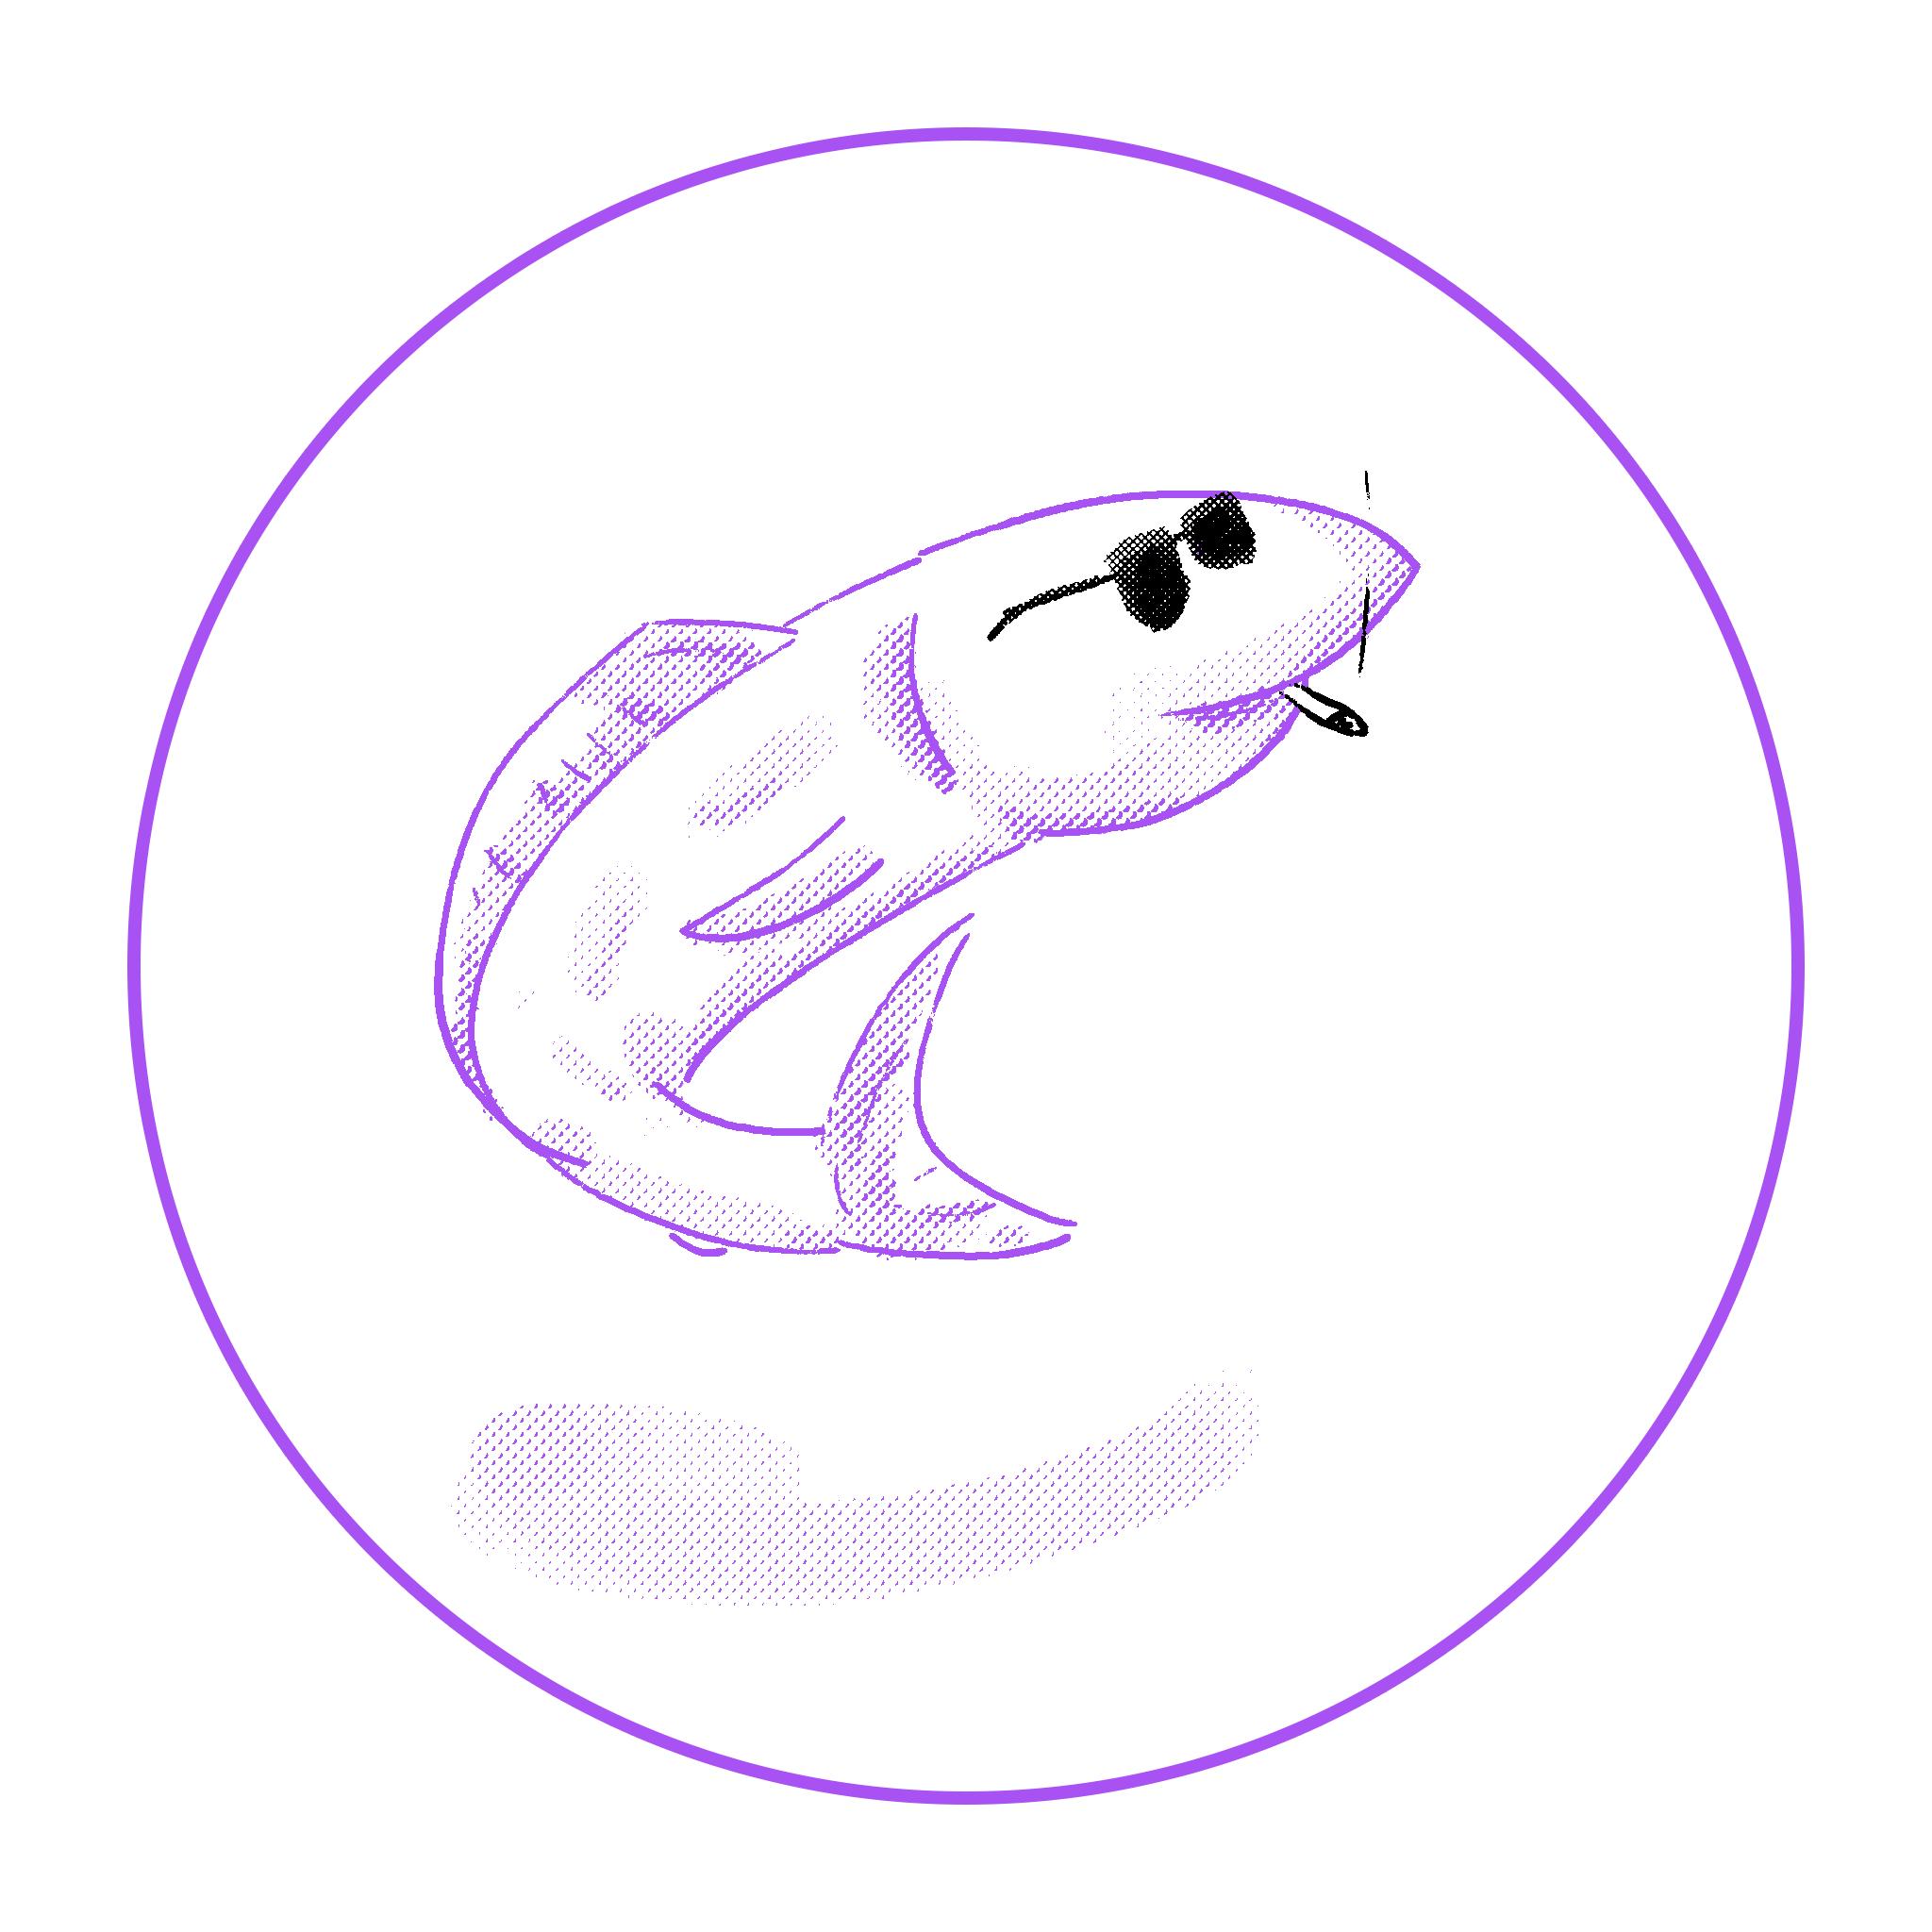 lac-bau-cua_tet-2018_2048x2048_190105_nh_v2.1_fish.png